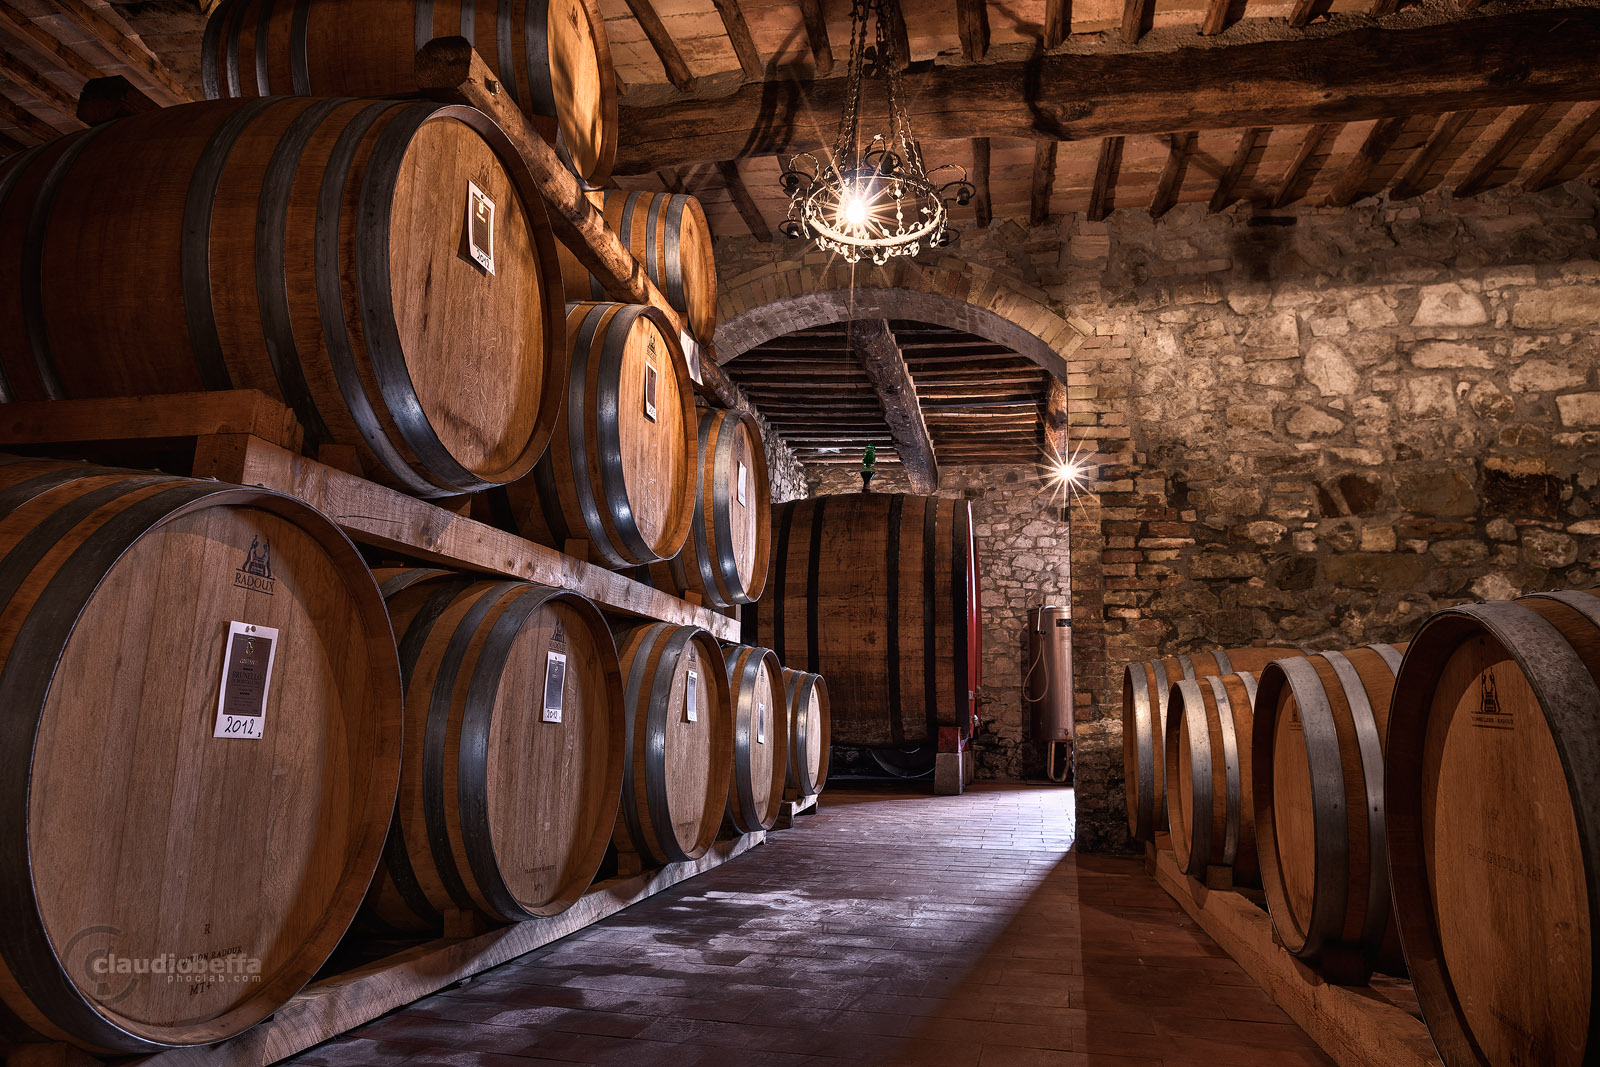 Cellar, Casks, Ancient, Wine, Wine-making, Costanti, Light, Wood, Bricks, Tuscany, Toscana, Val d'Orcia, Montalcino, Italy, Italia